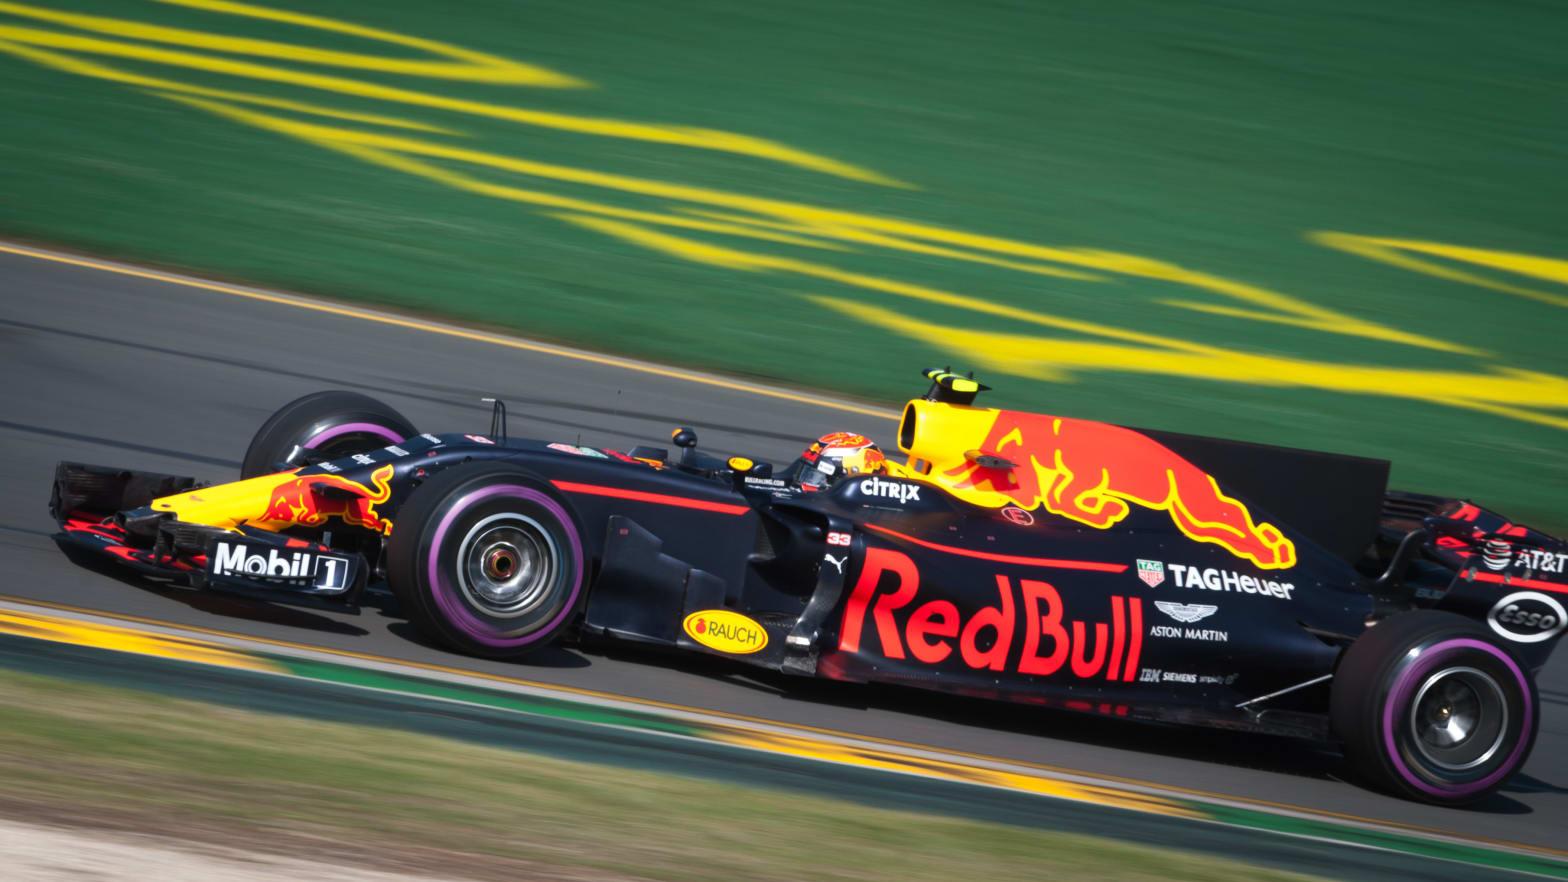 10 important trends in sports sponsorships